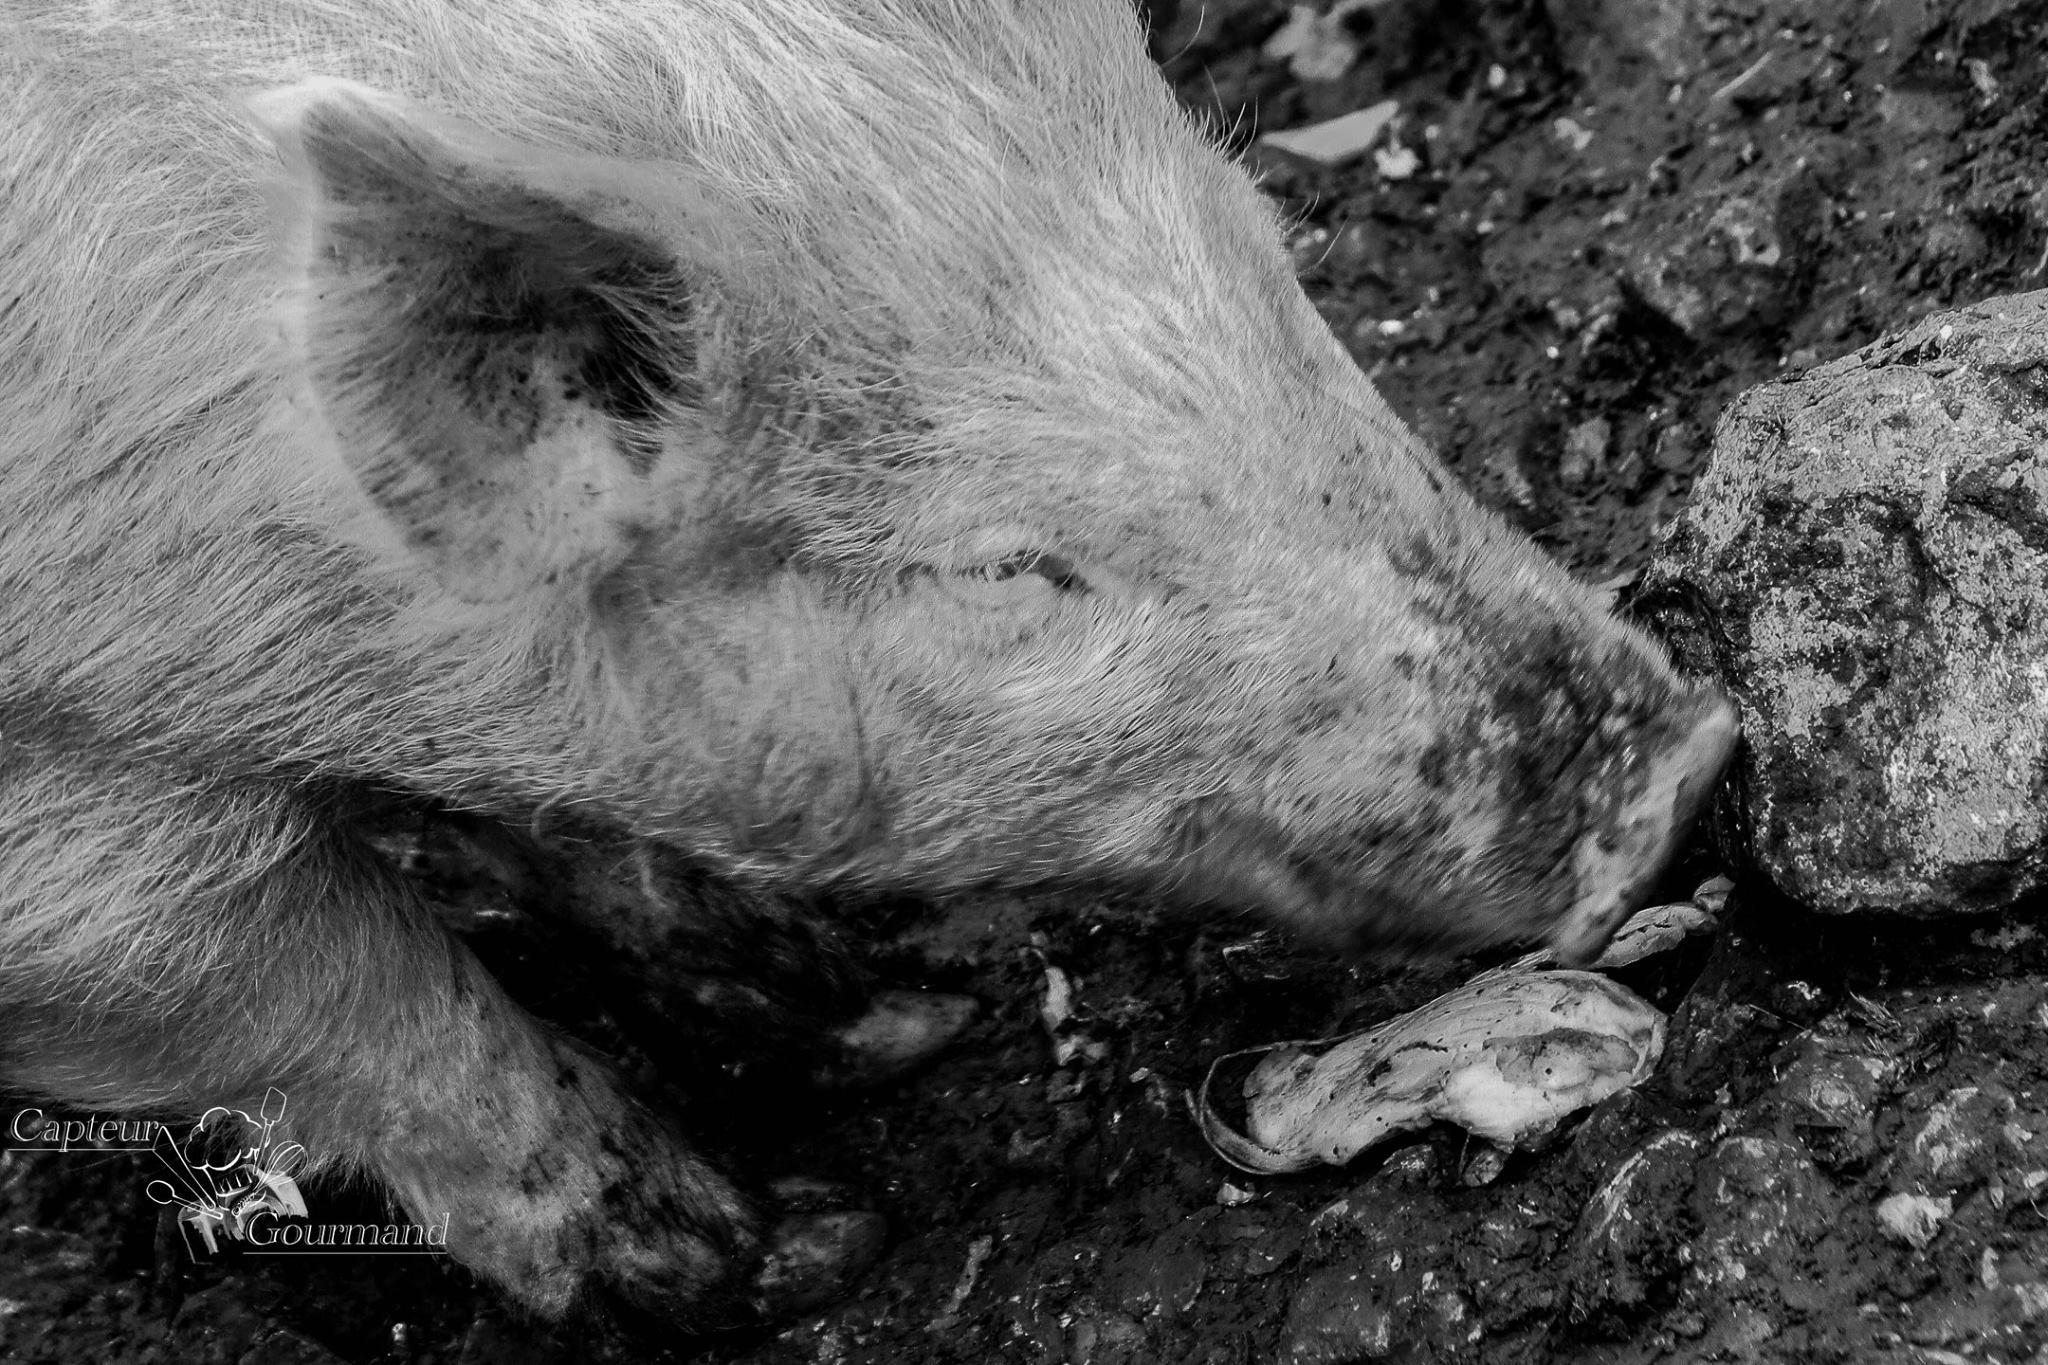 Elevage de porcs Bio. Les Cochons de la Cote d'Azur (1).jpg